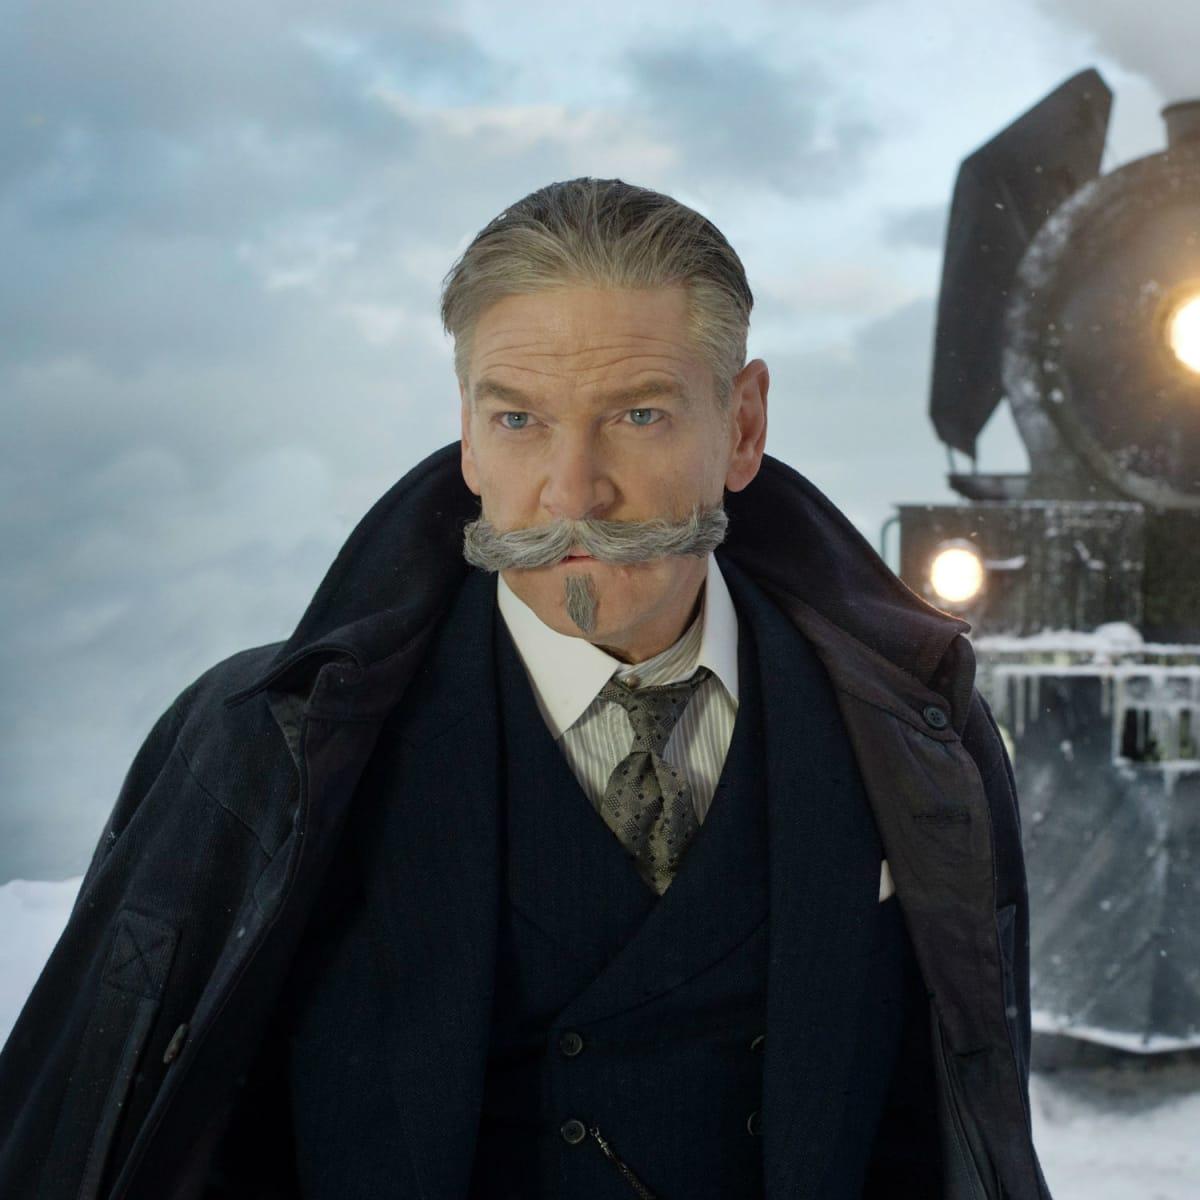 Kenneth Branagh in Murder on the Orient Express